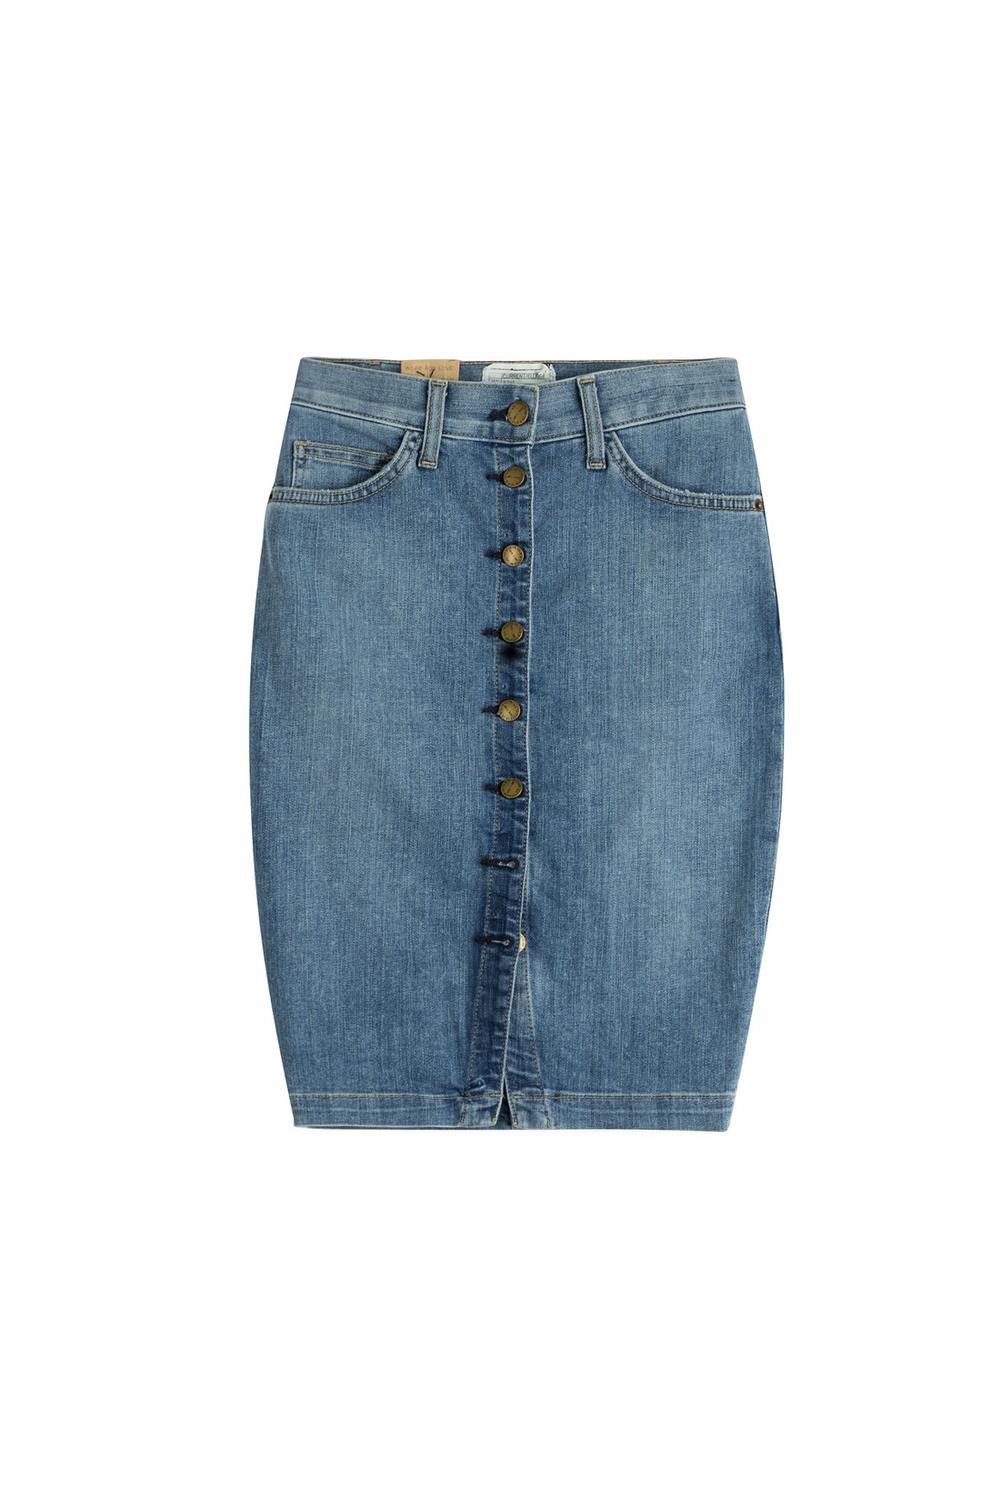 11-spring-denim-trends-button-down-skirt-023.jpg